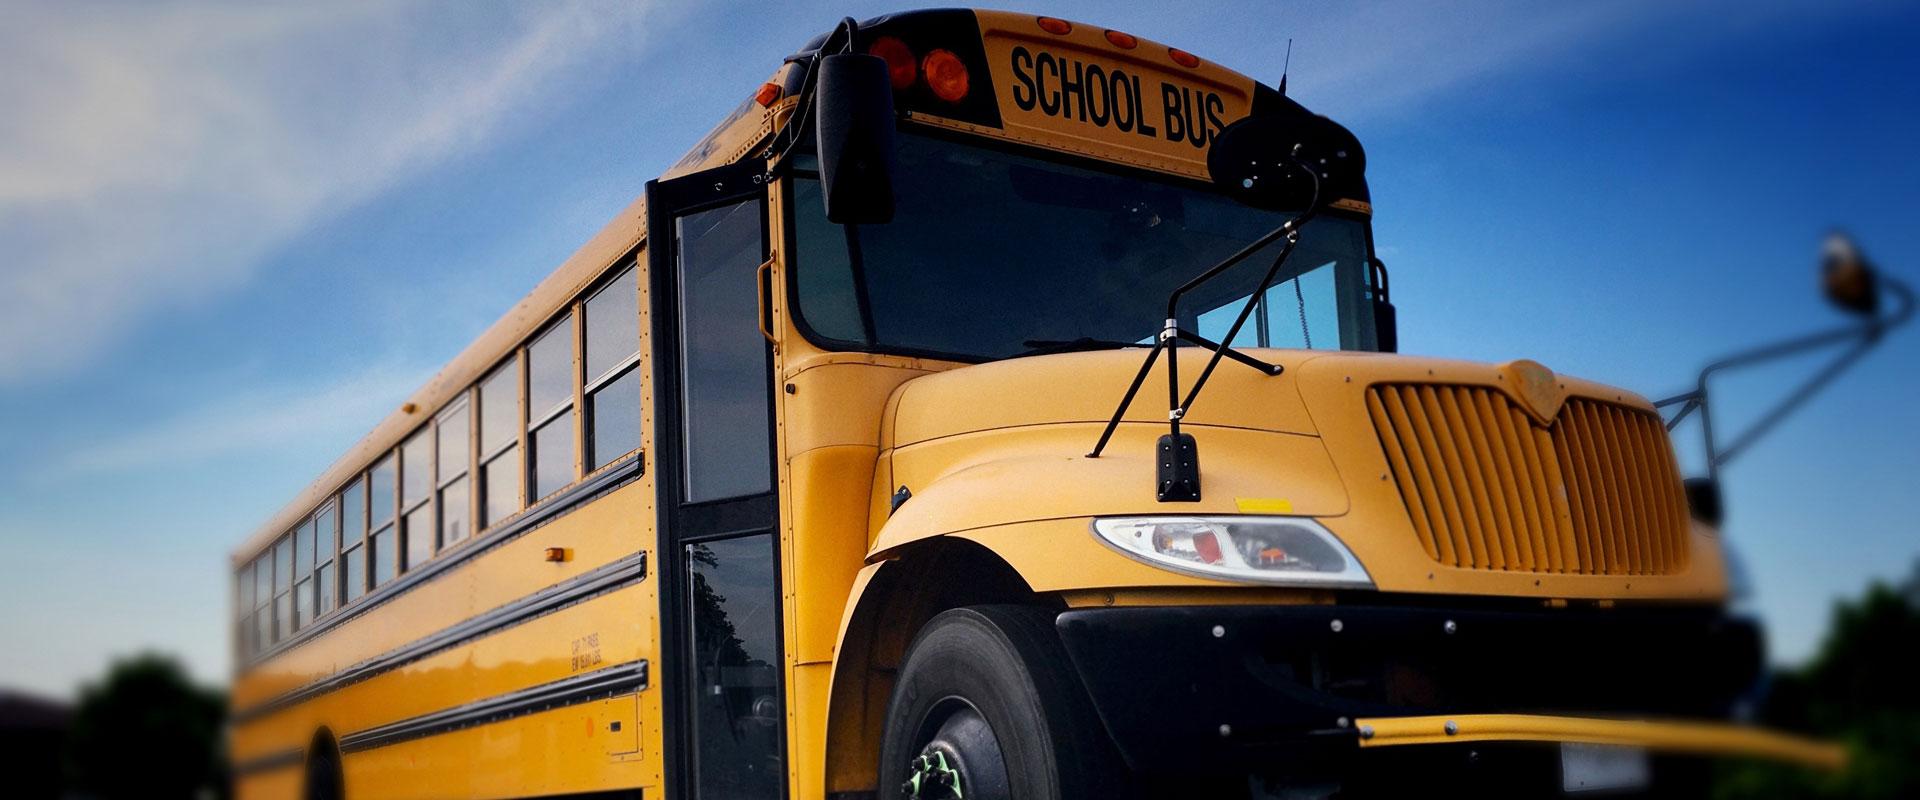 post-school-bus